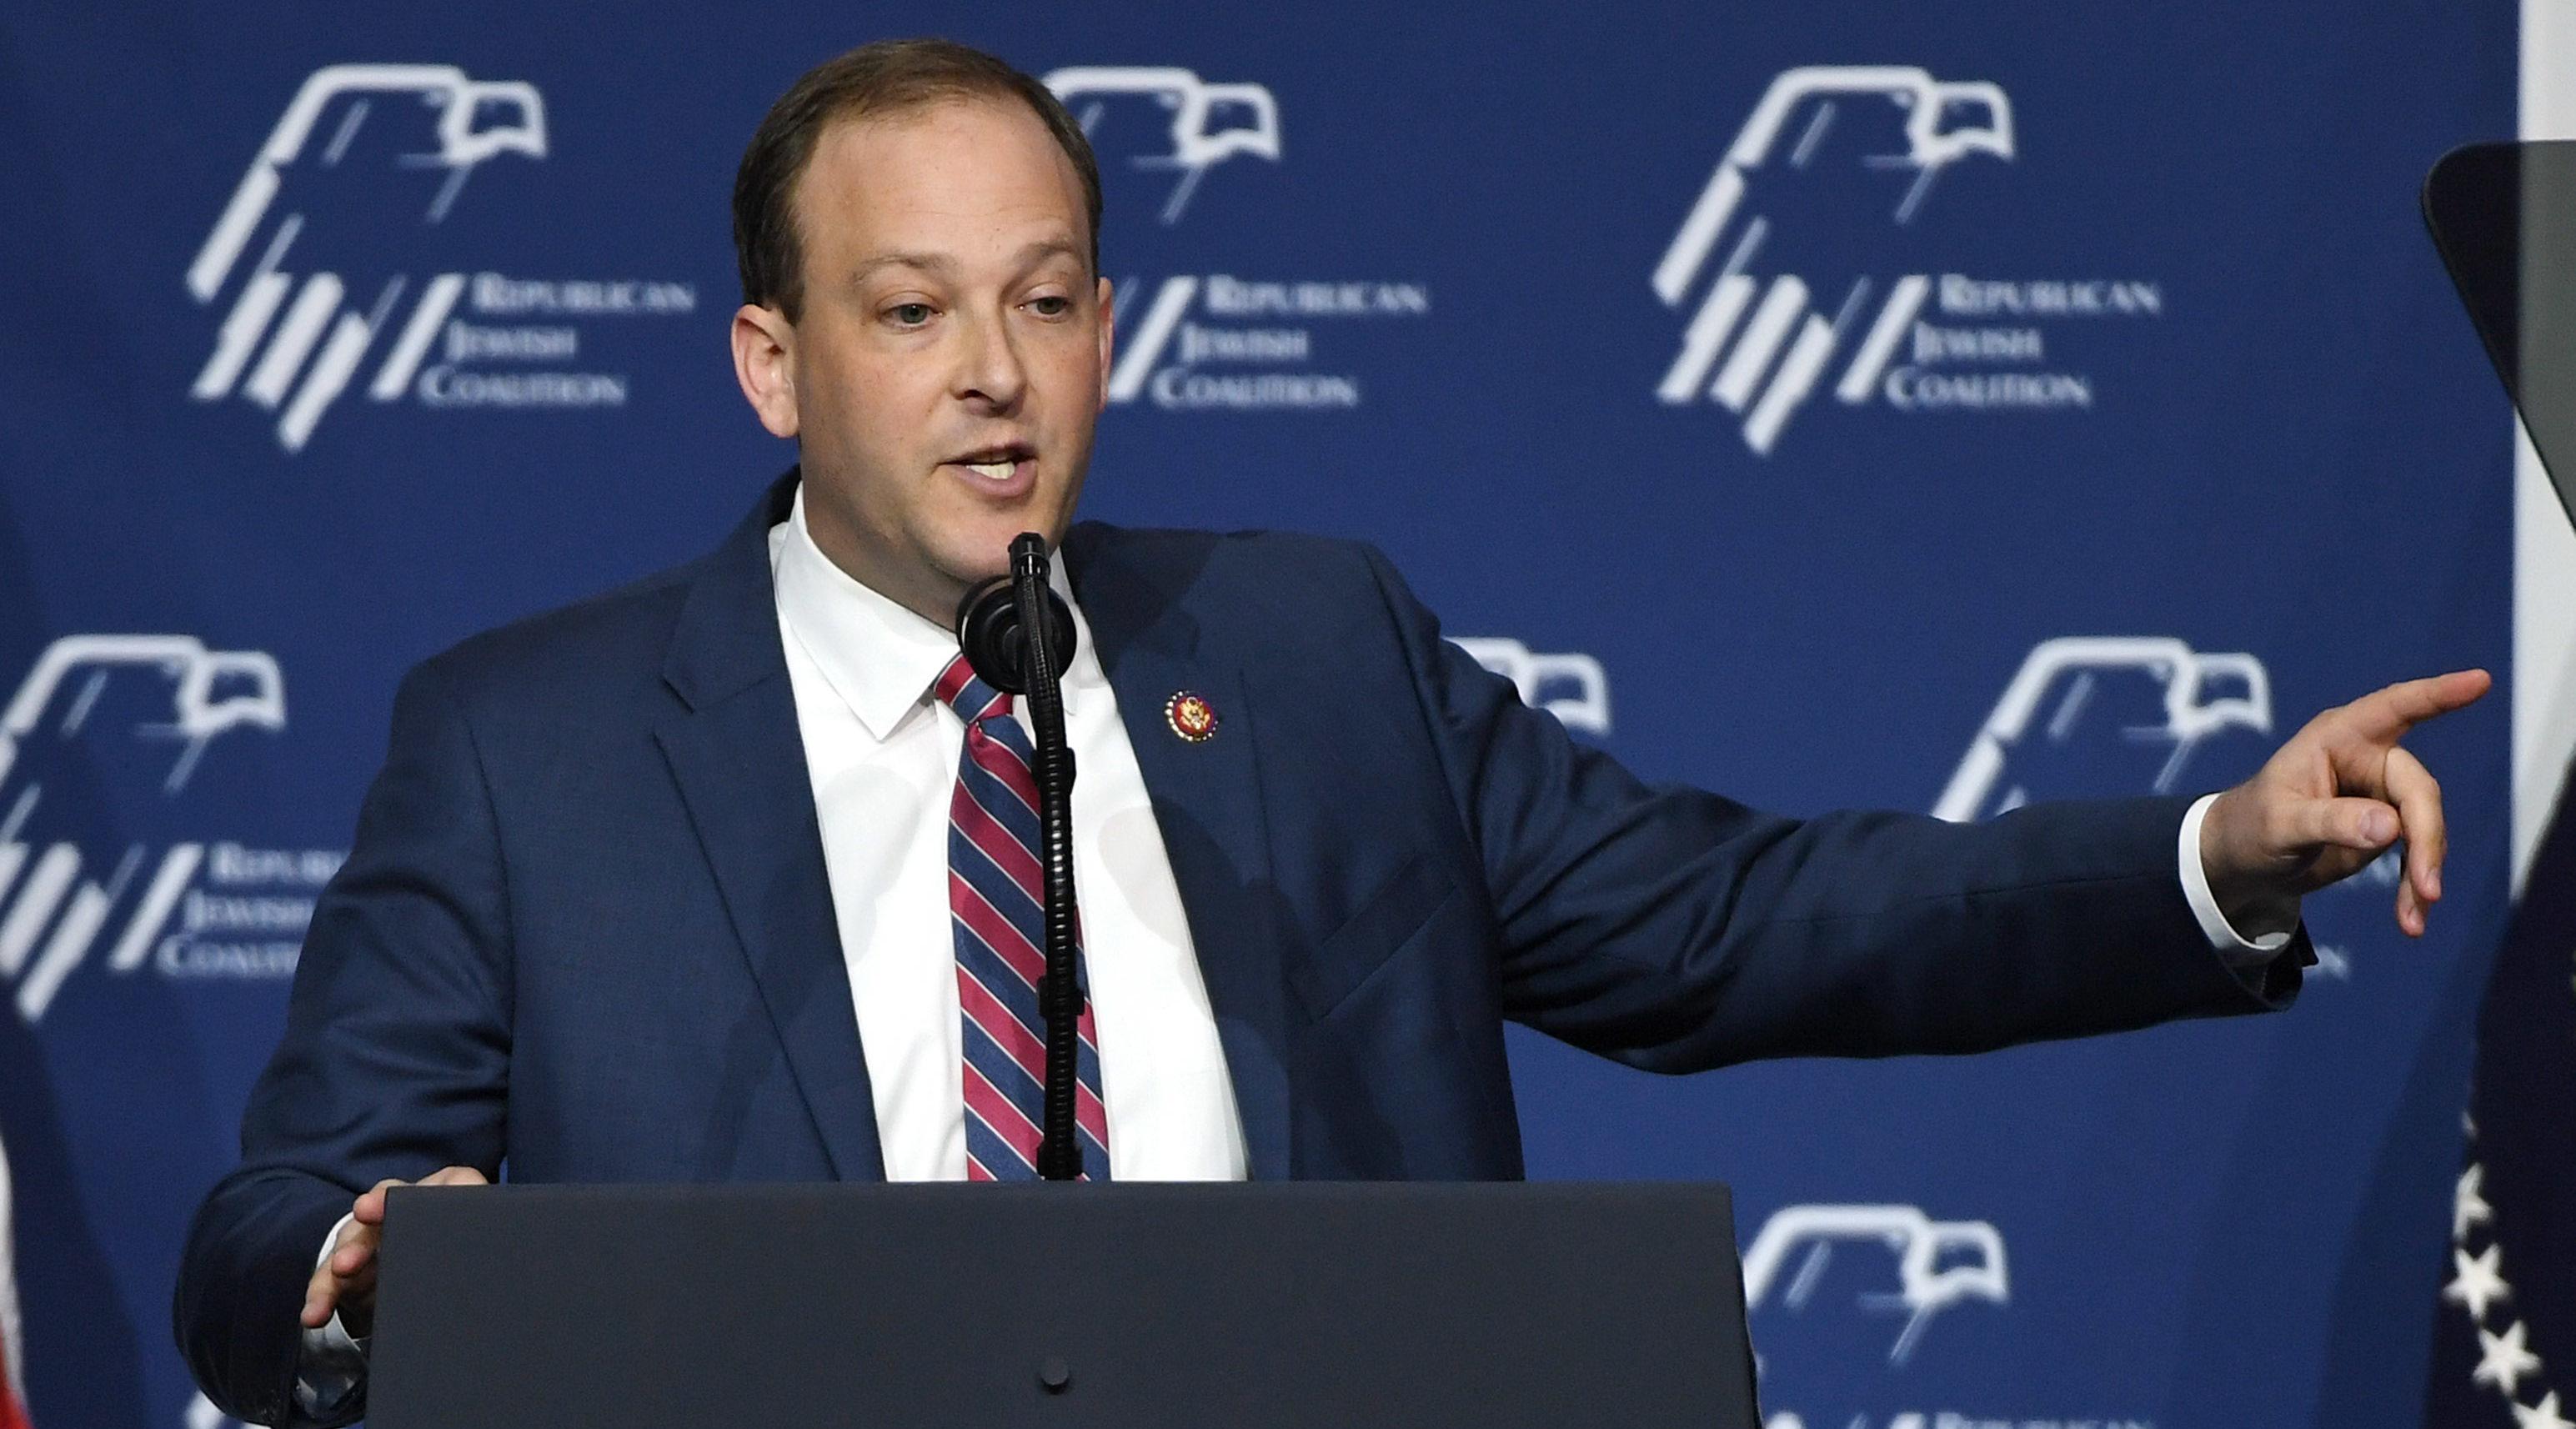 Rep. Lee Zeldin considering run for New York governor